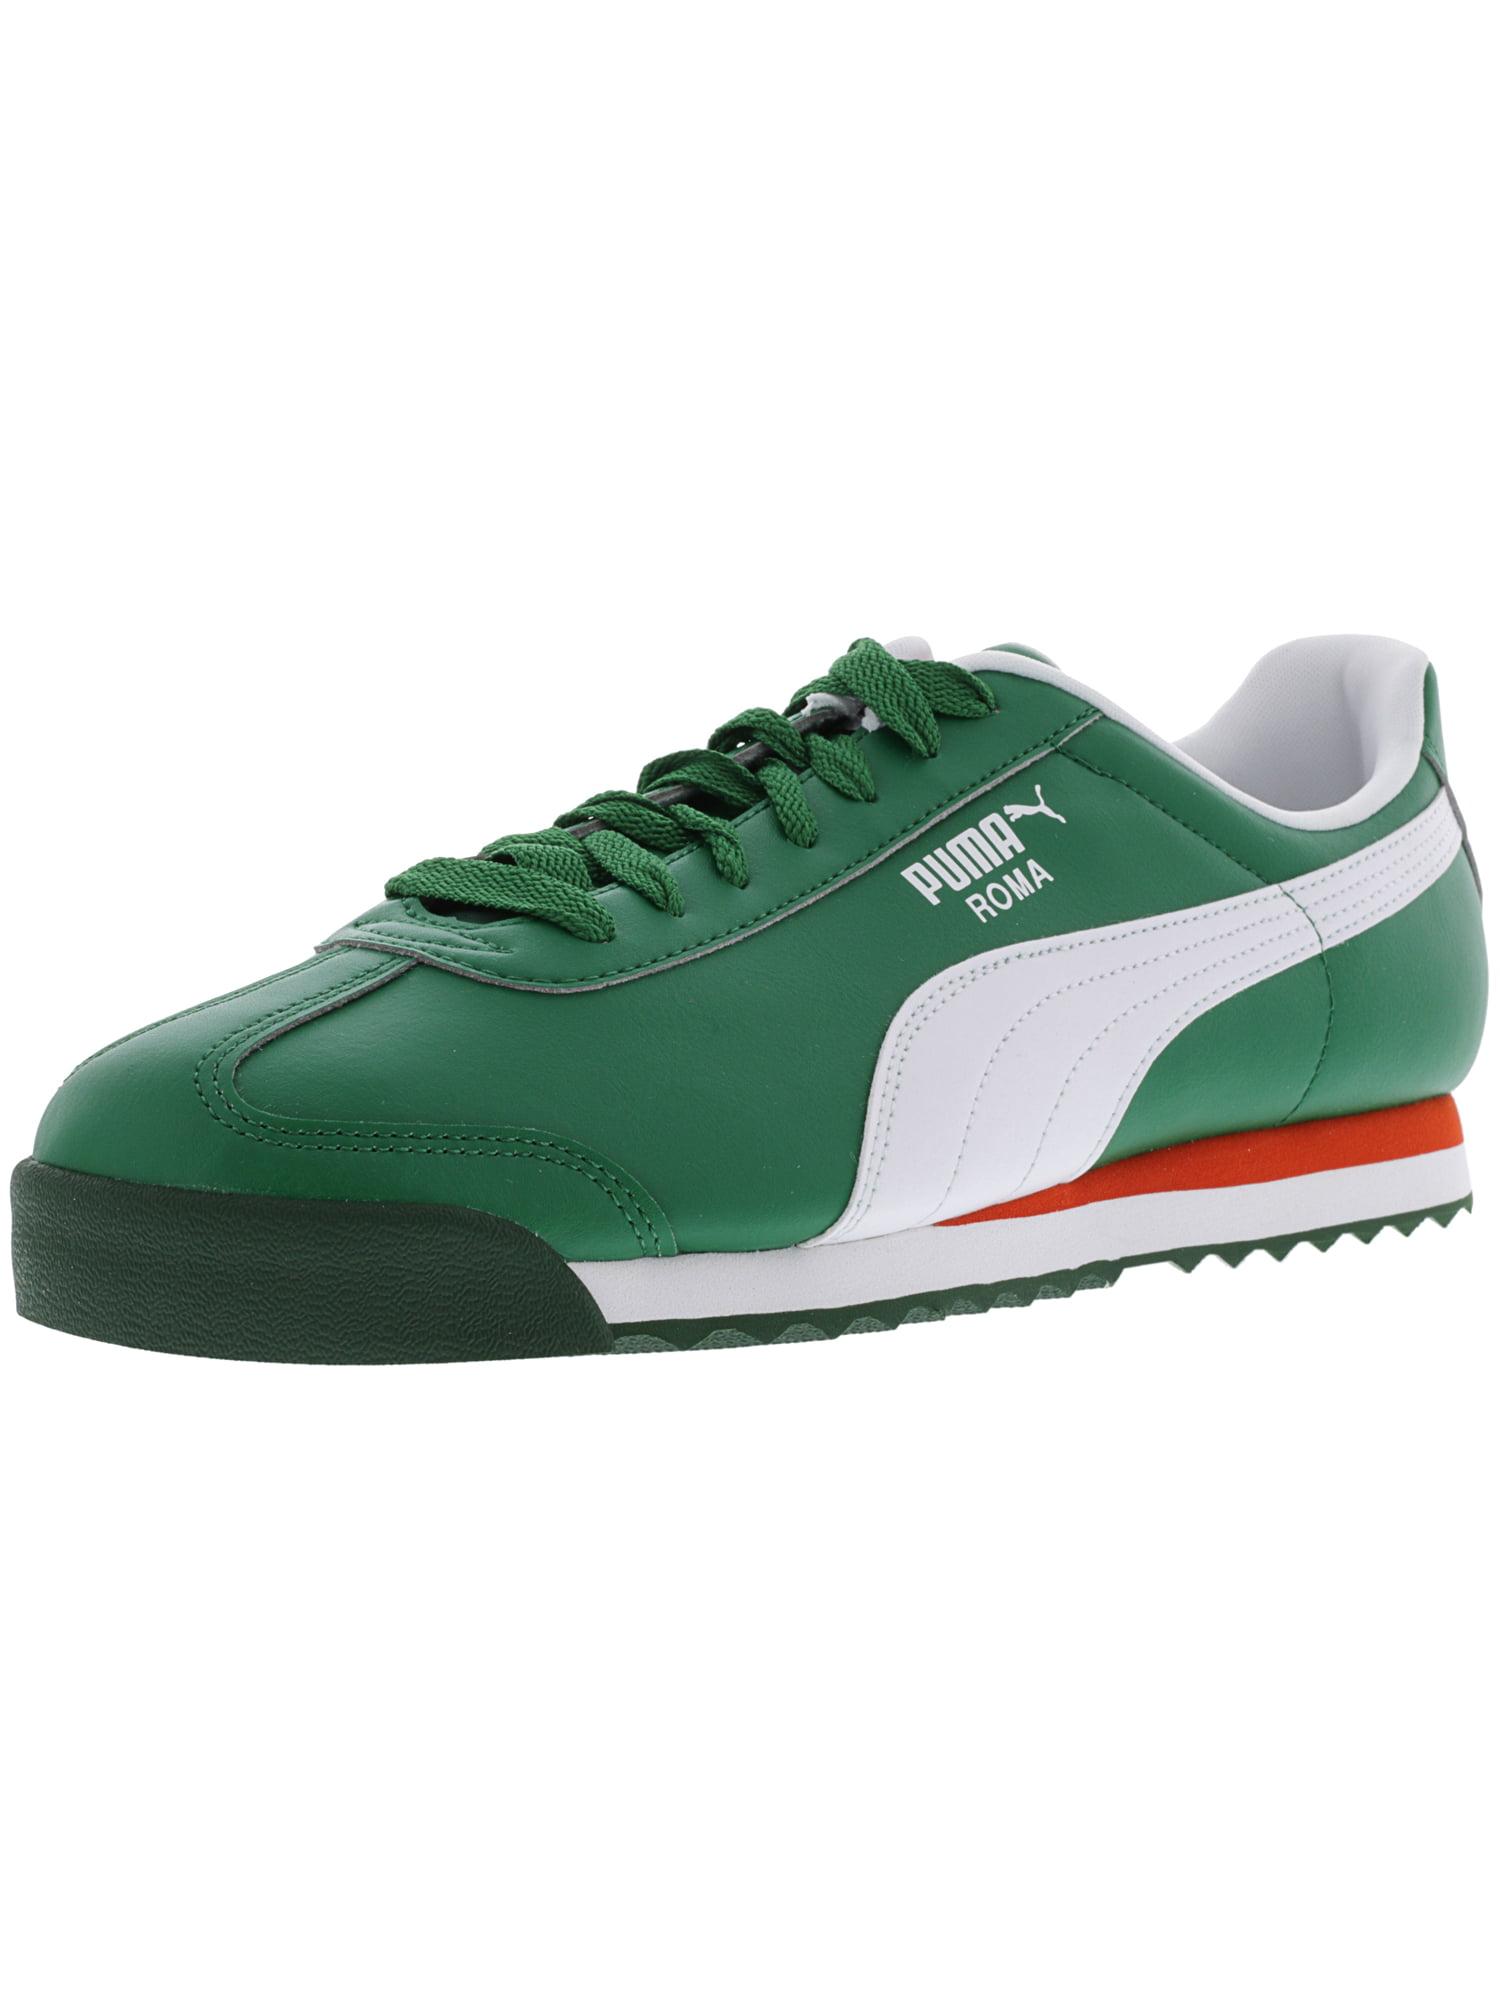 Puma Men's Roma Basic Verdant Green